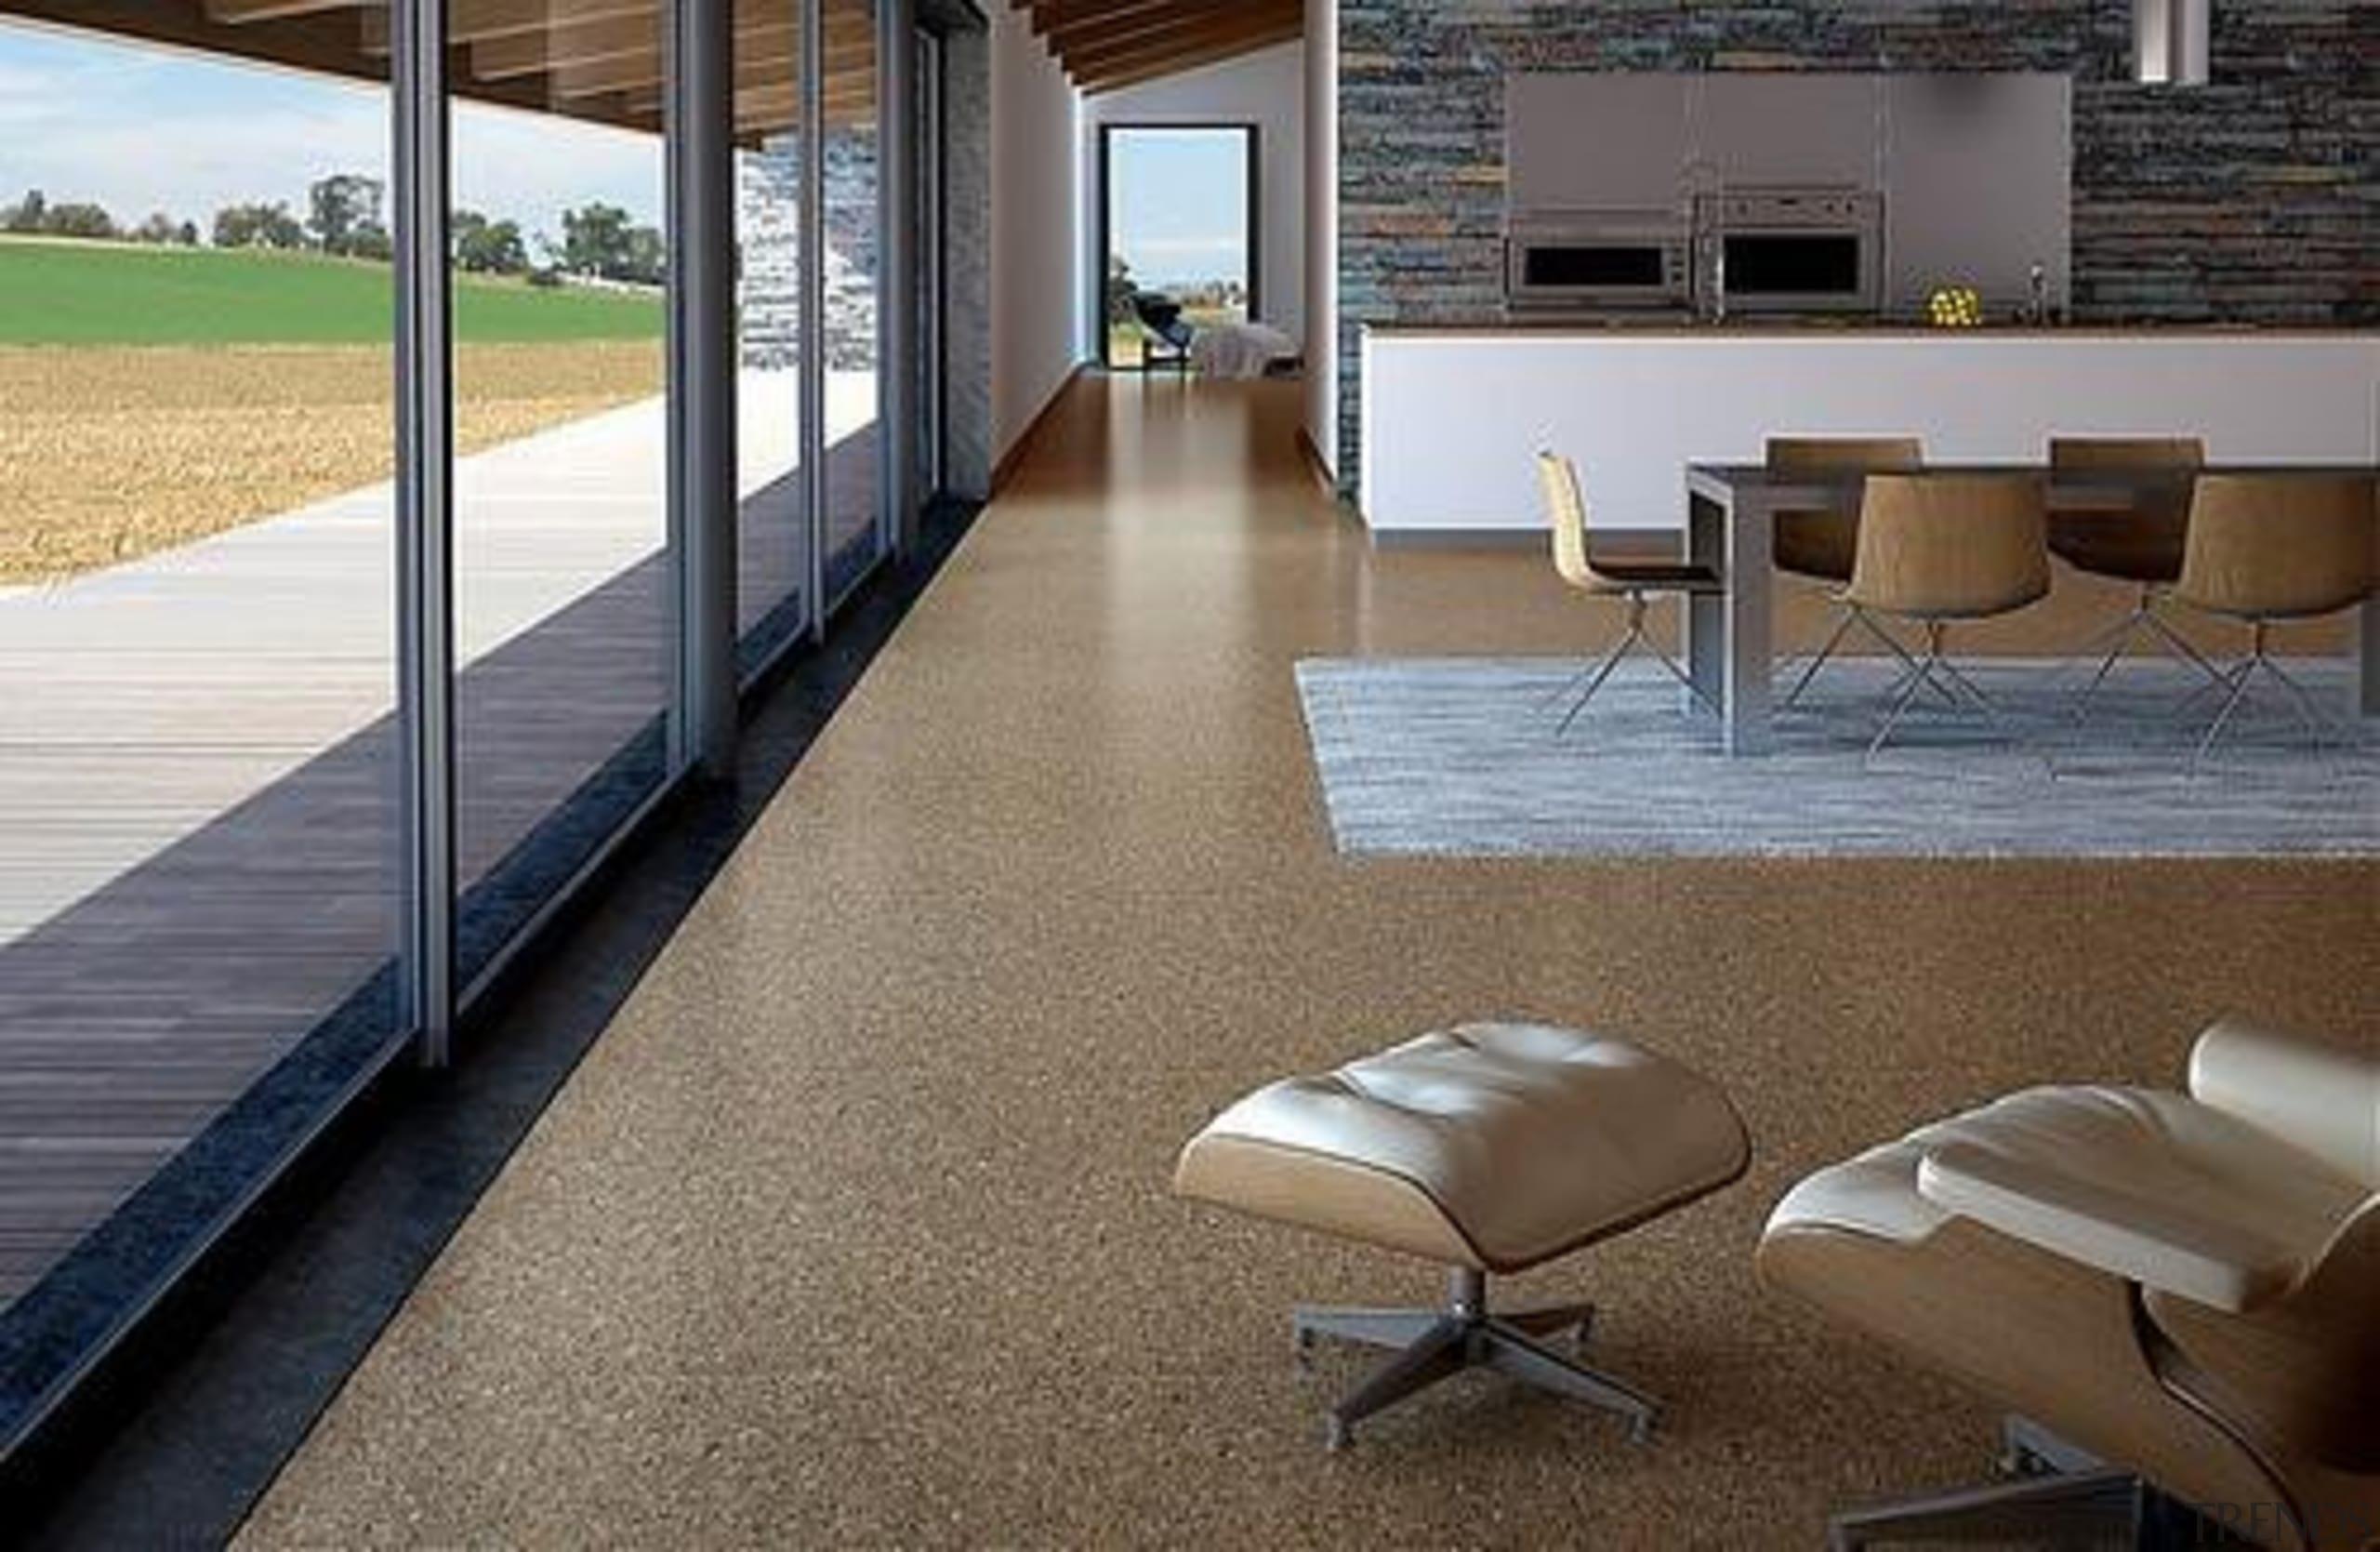 Cork Comfort - Originals Natural - Cork Comfort architecture, daylighting, floor, flooring, furniture, hardwood, house, interior design, laminate flooring, real estate, table, tile, window, wood, wood flooring, gray, brown